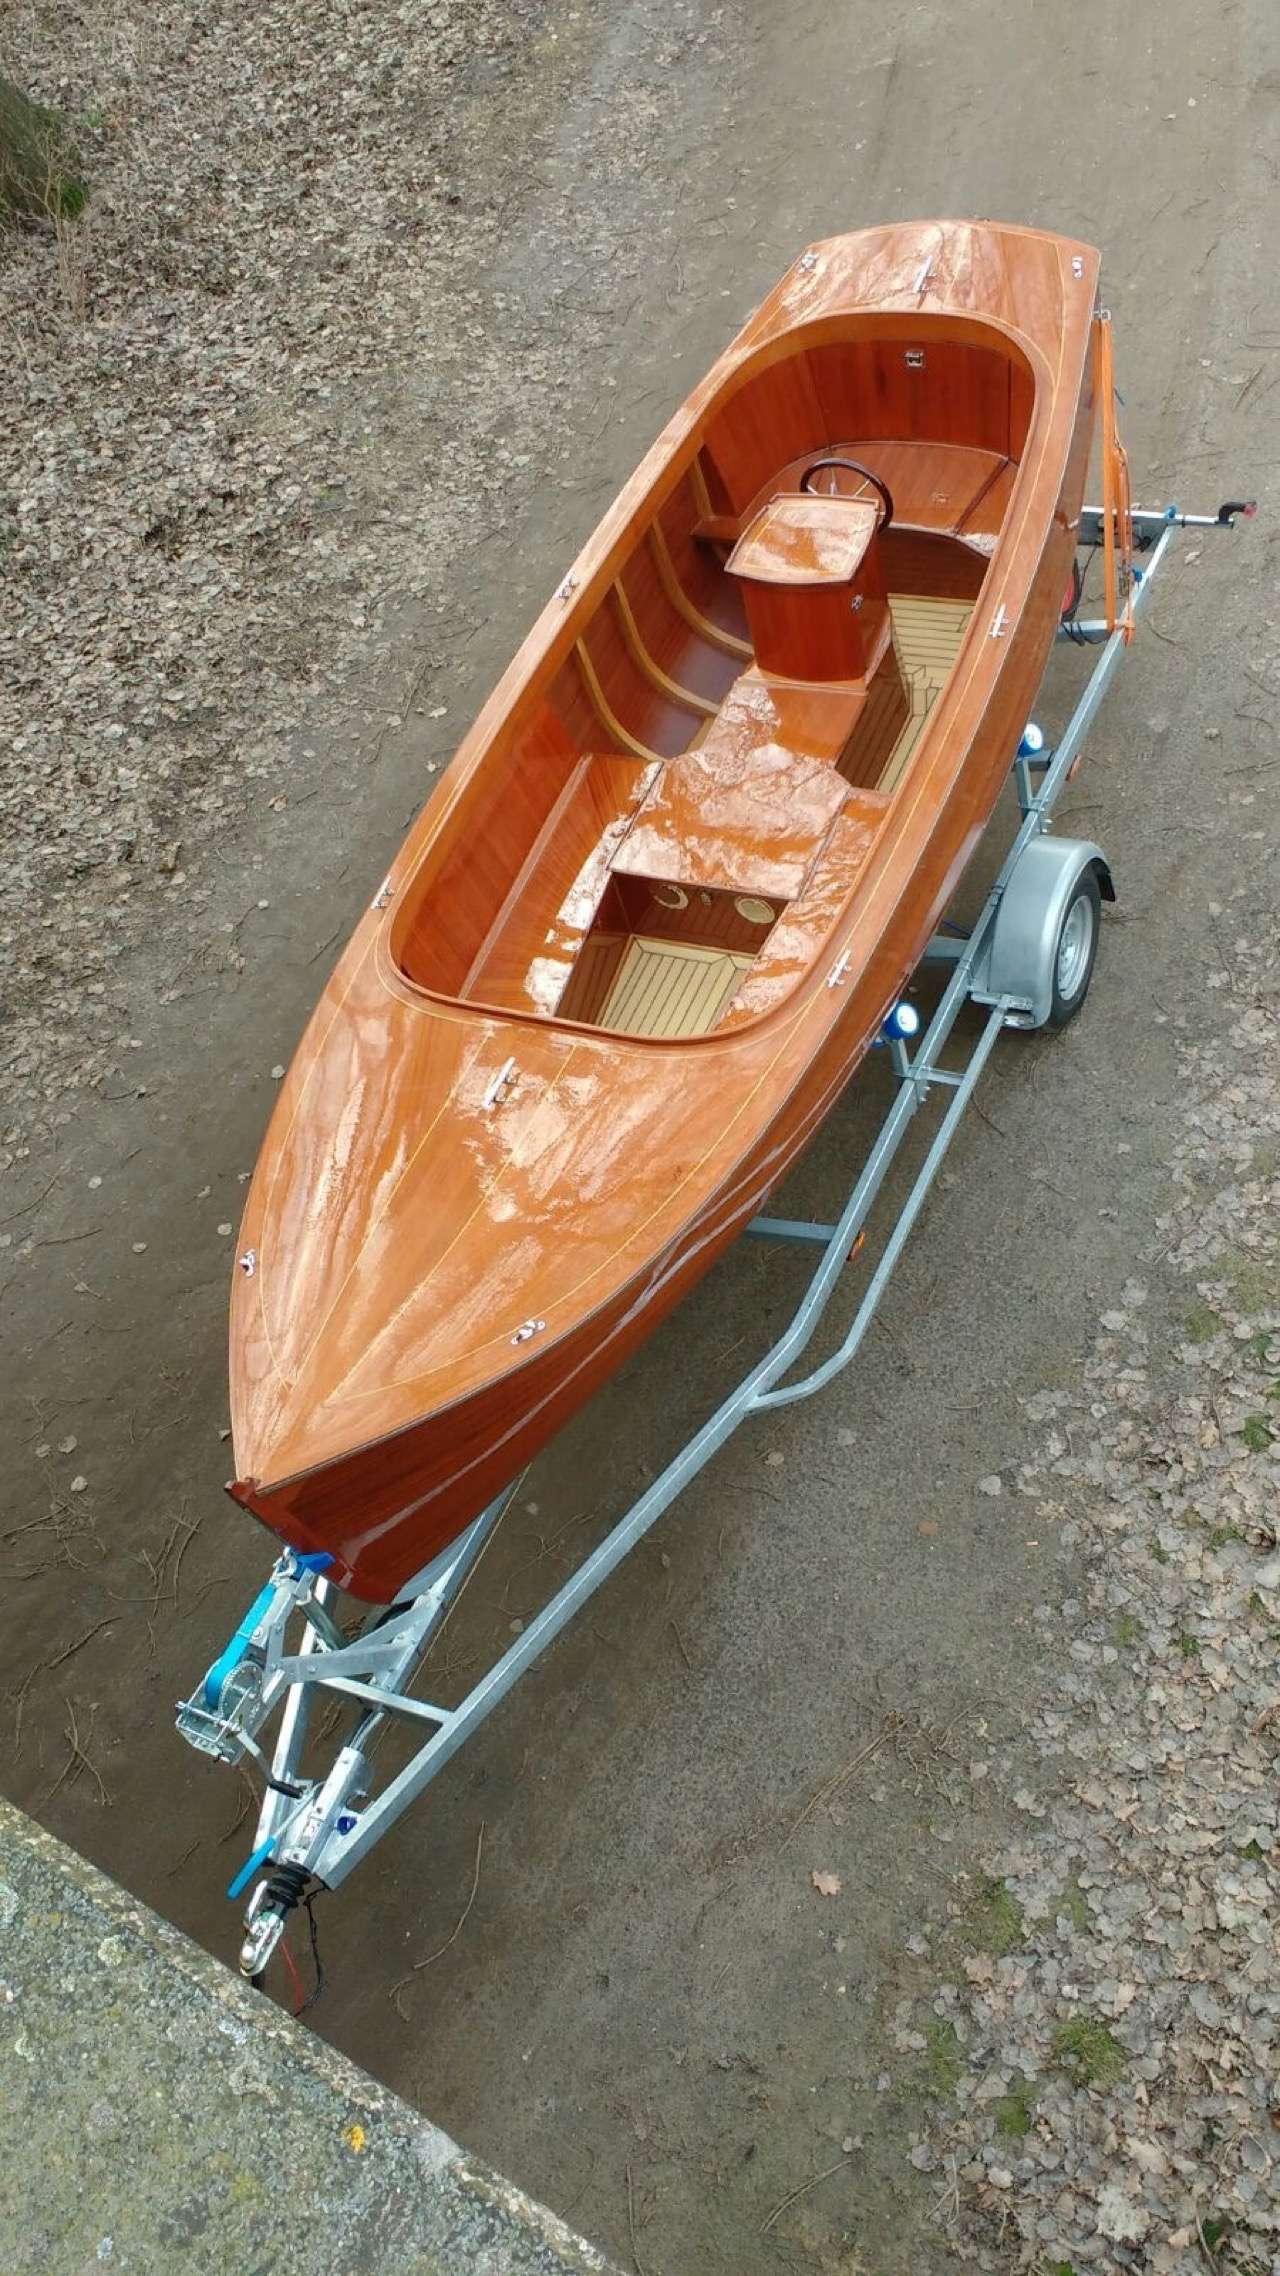 Serge Dierick wint boten bouw award